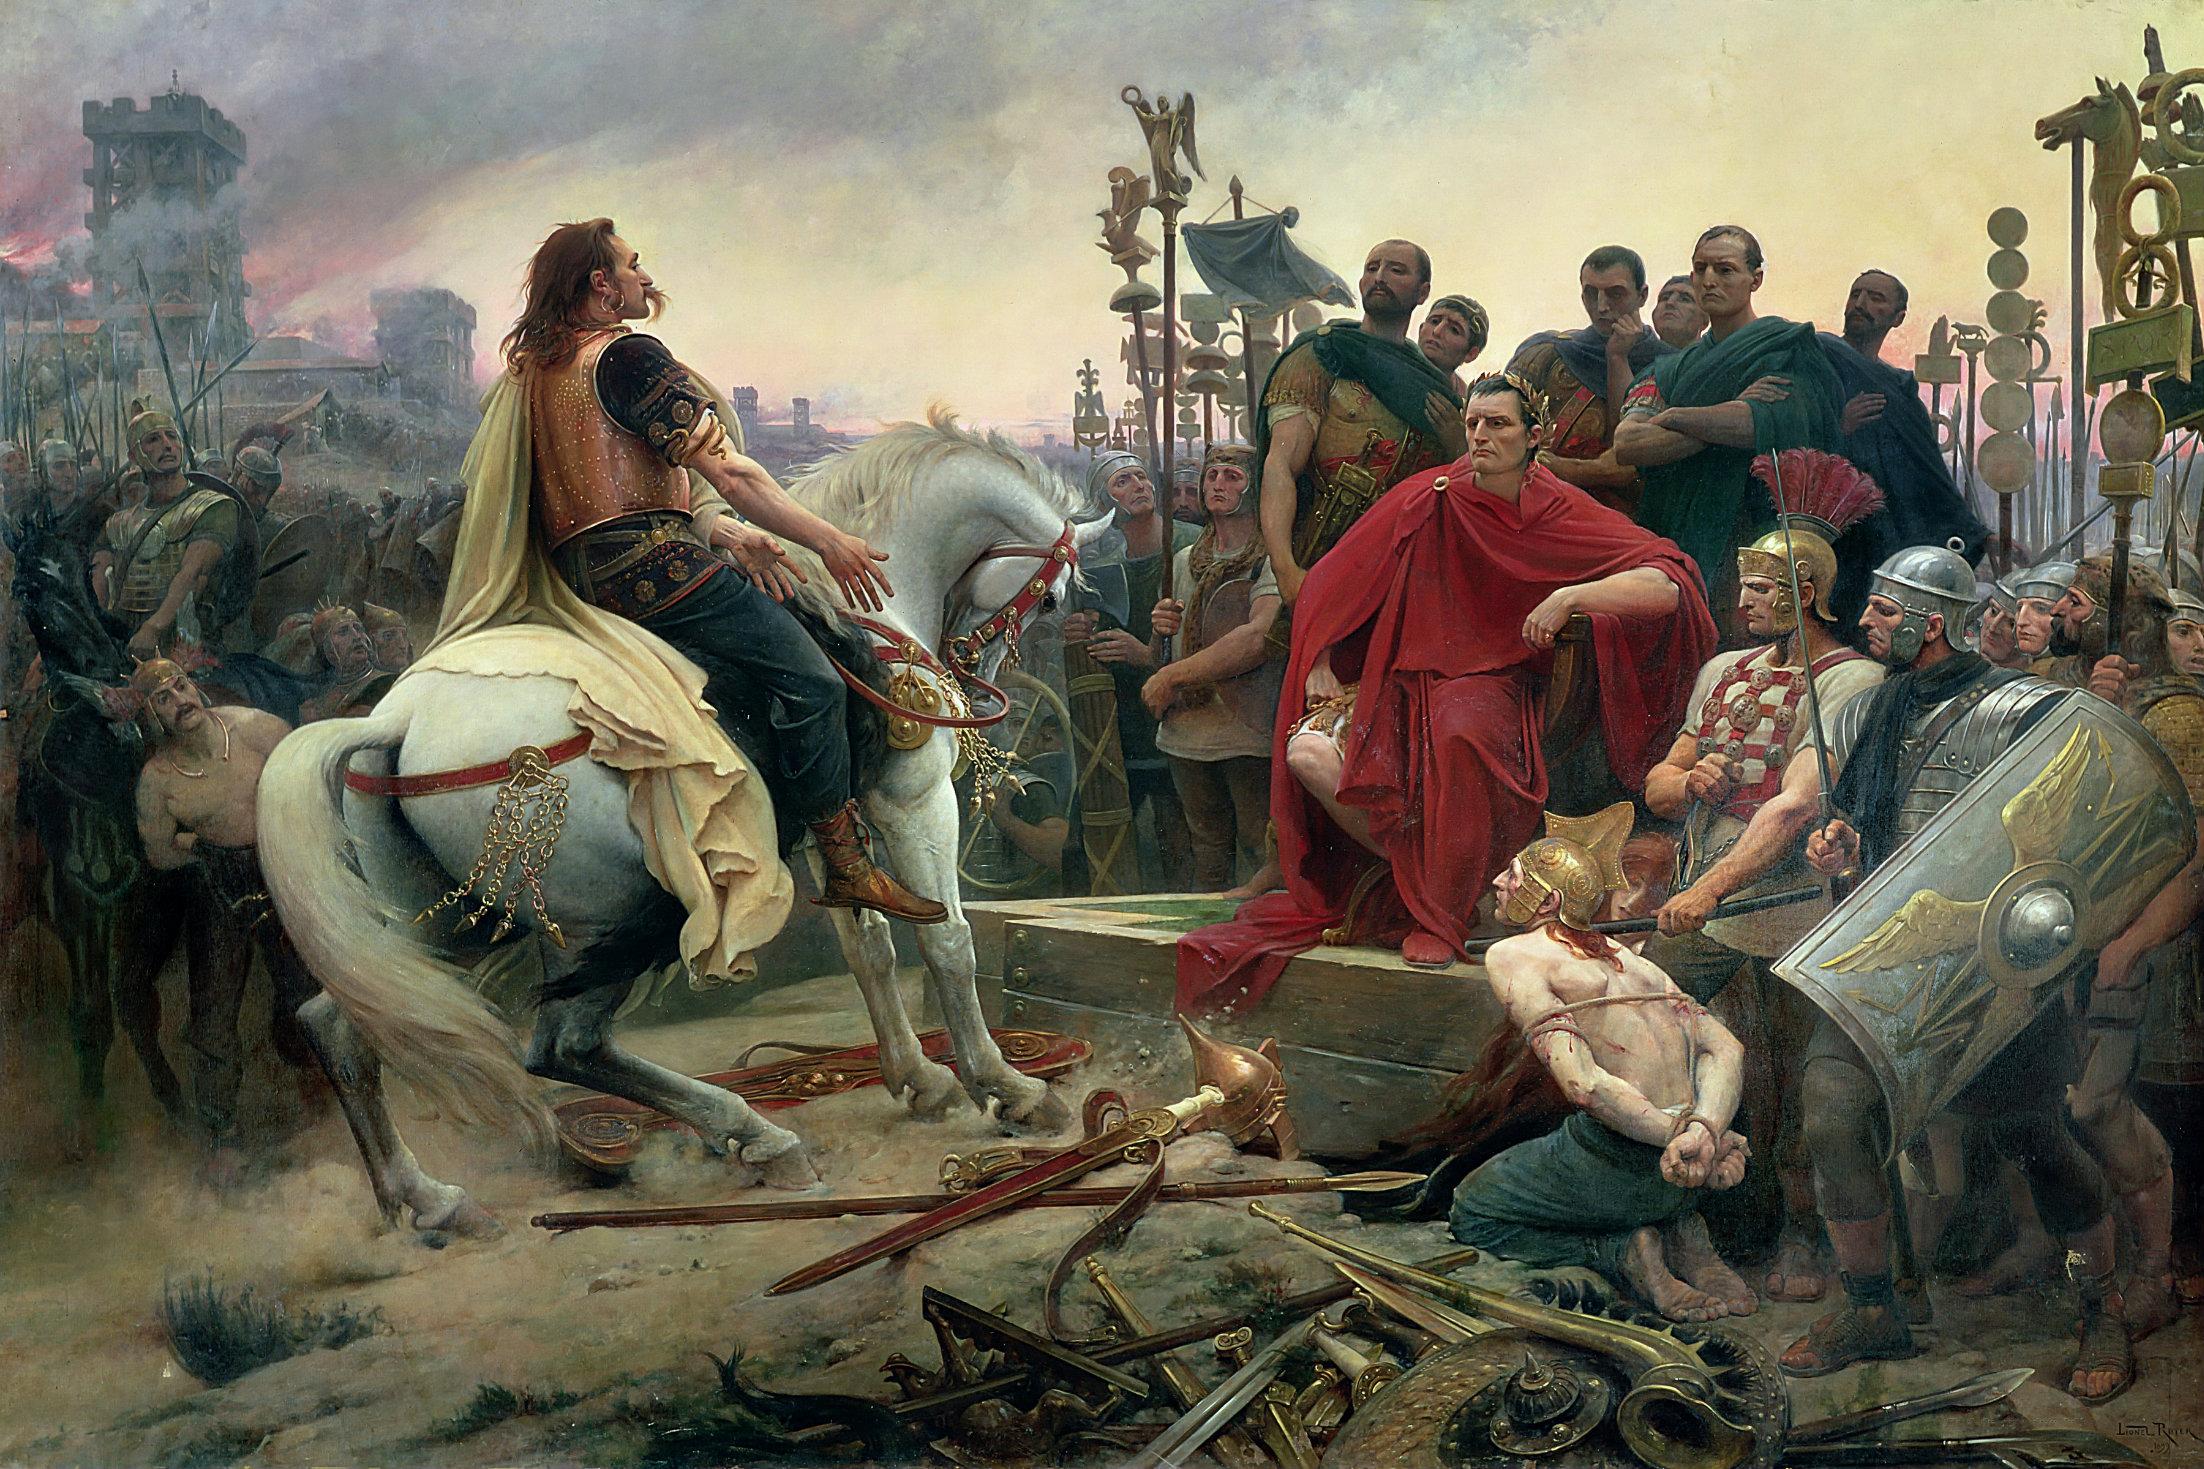 Vercingetorix surrenders at Alesia